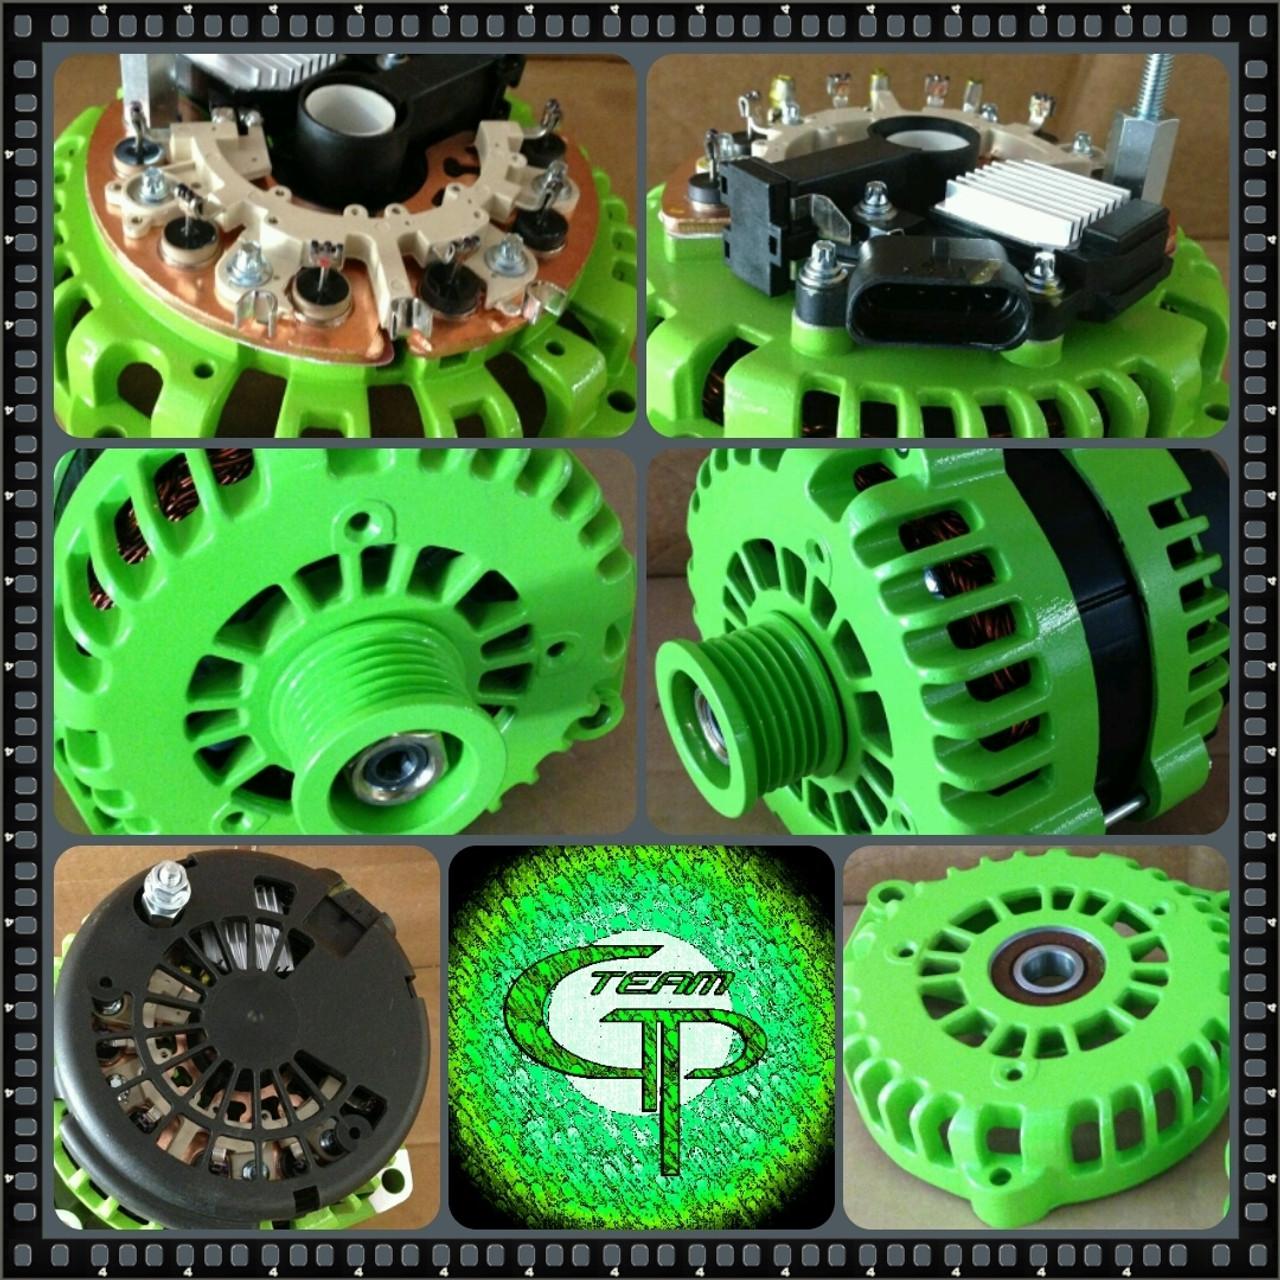 CHEVROLET CRUZE 1.4L  -2011-2014- 240 AMP TEAM GP Alternator